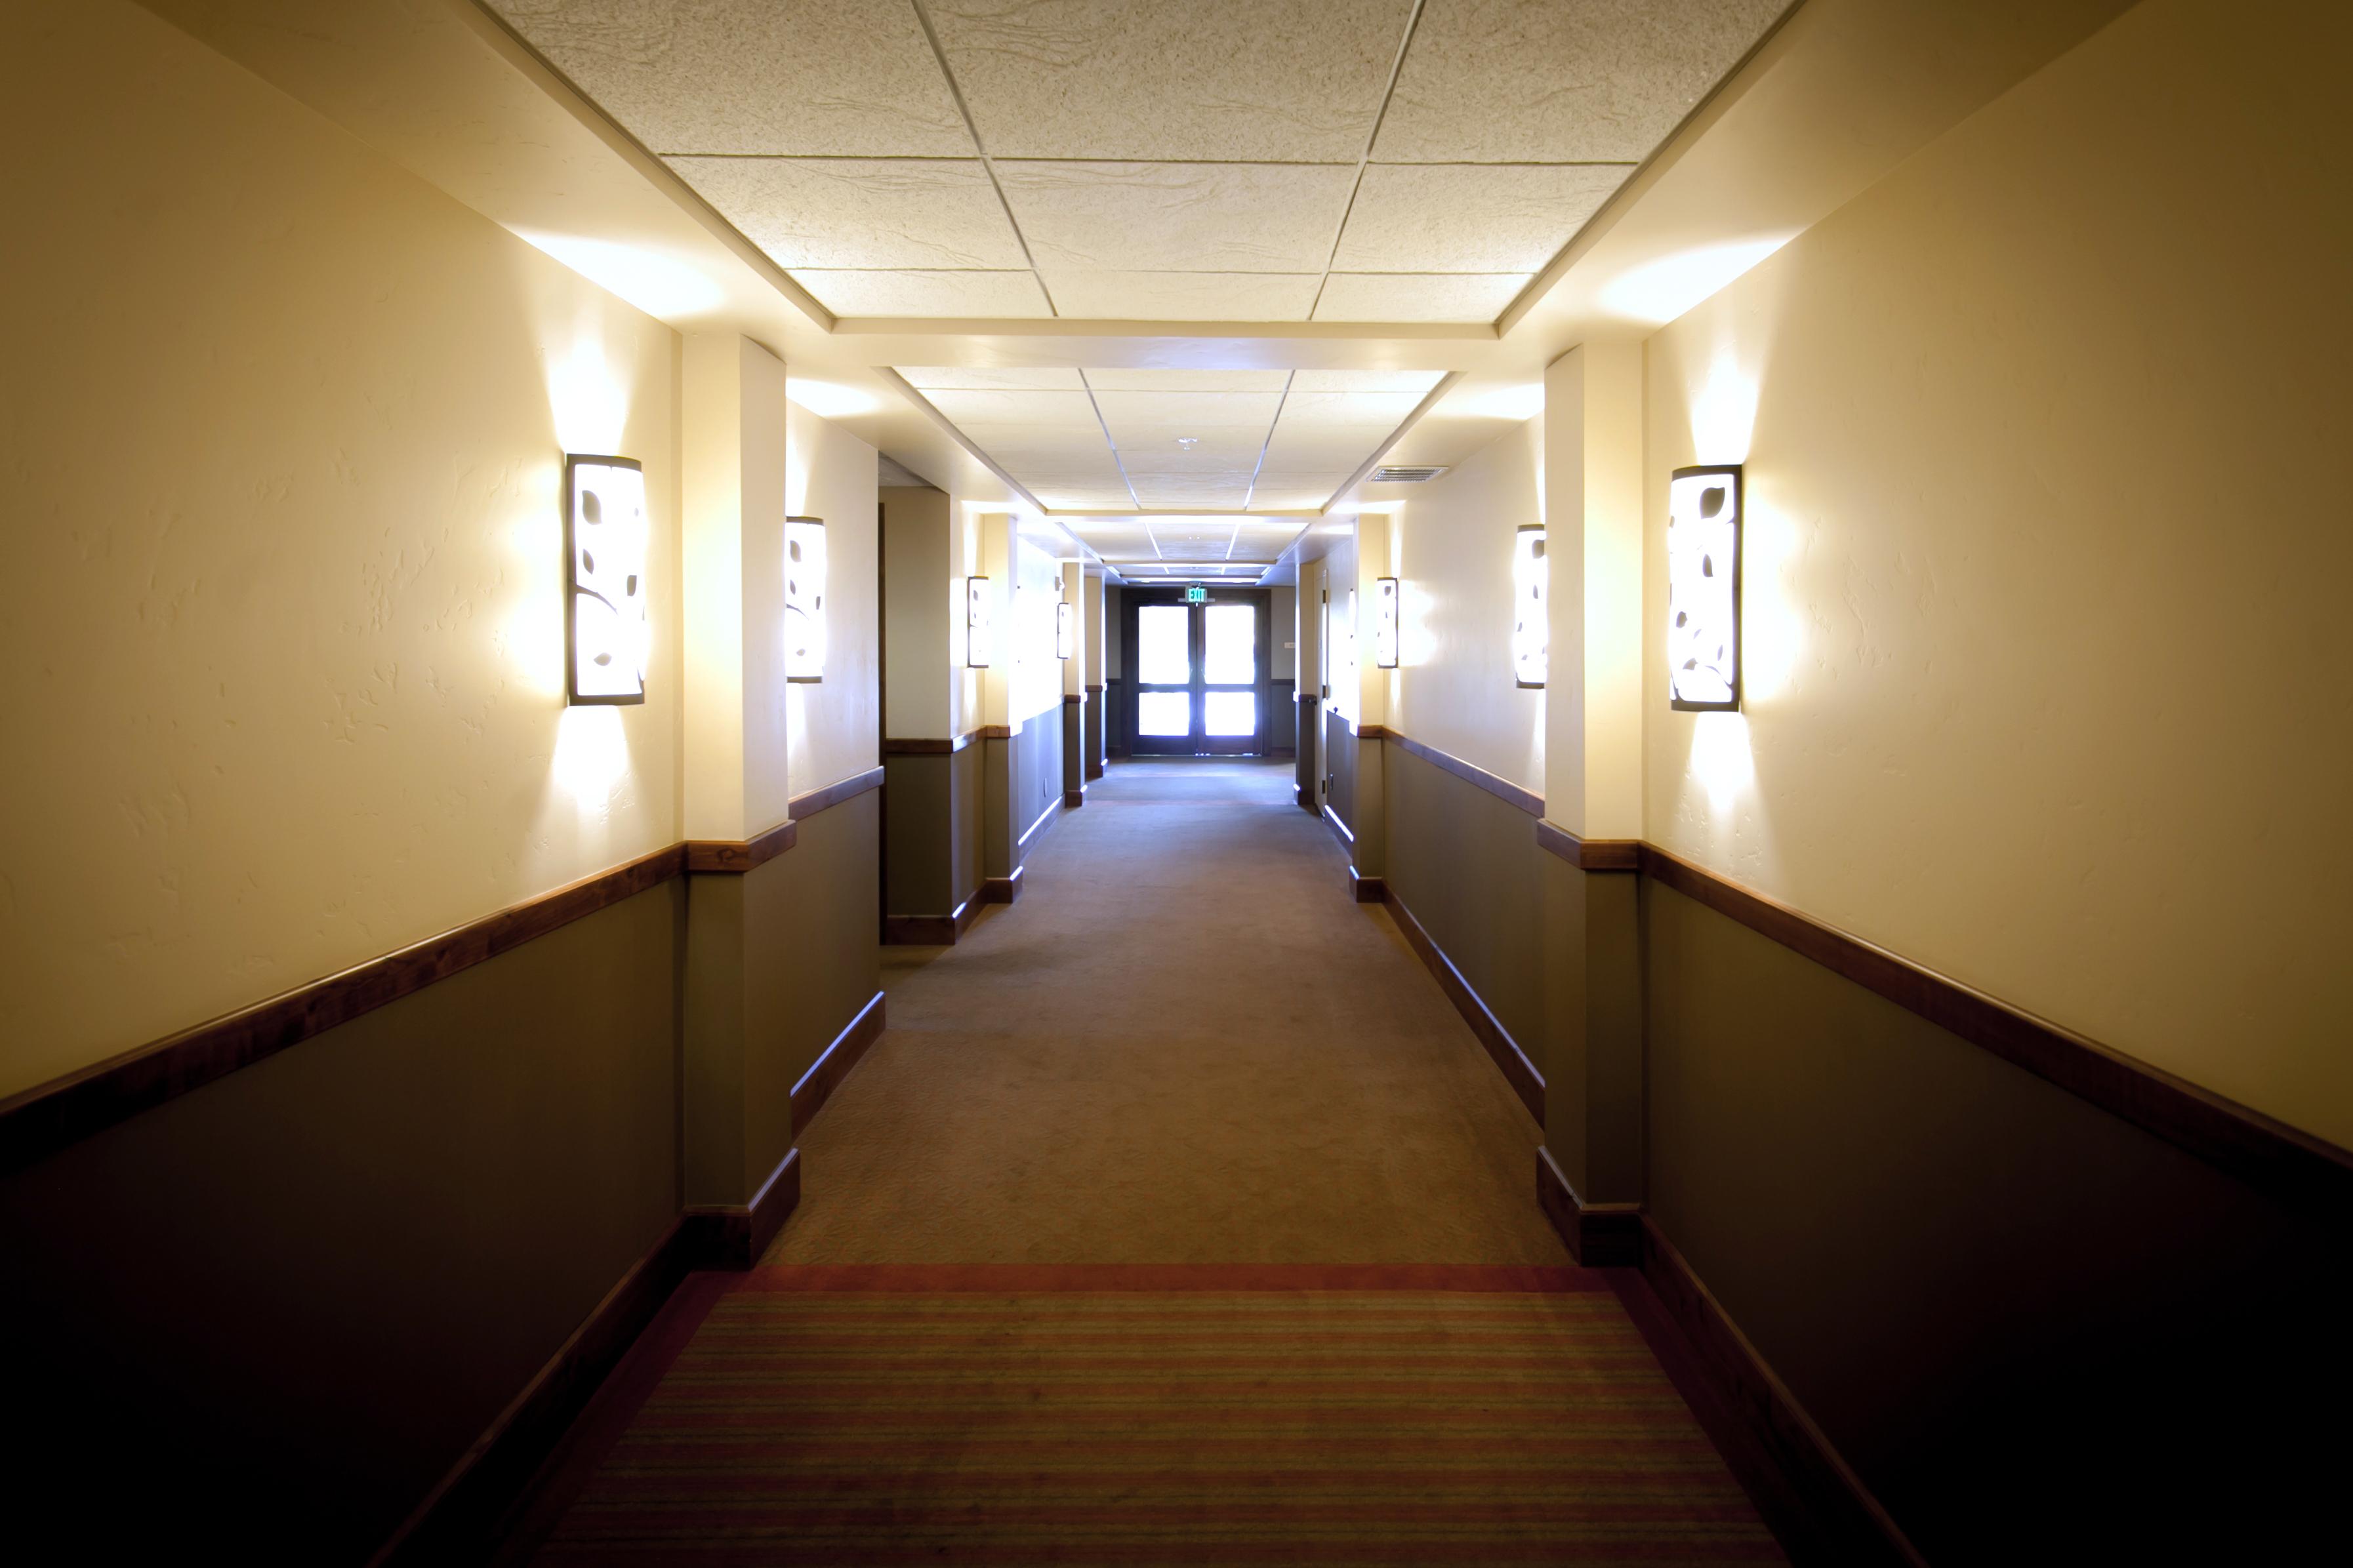 hotel hallway lighting. Hall Room Lighting Interior Design Indoors Lights Hotel Hallway Wall Lamps R